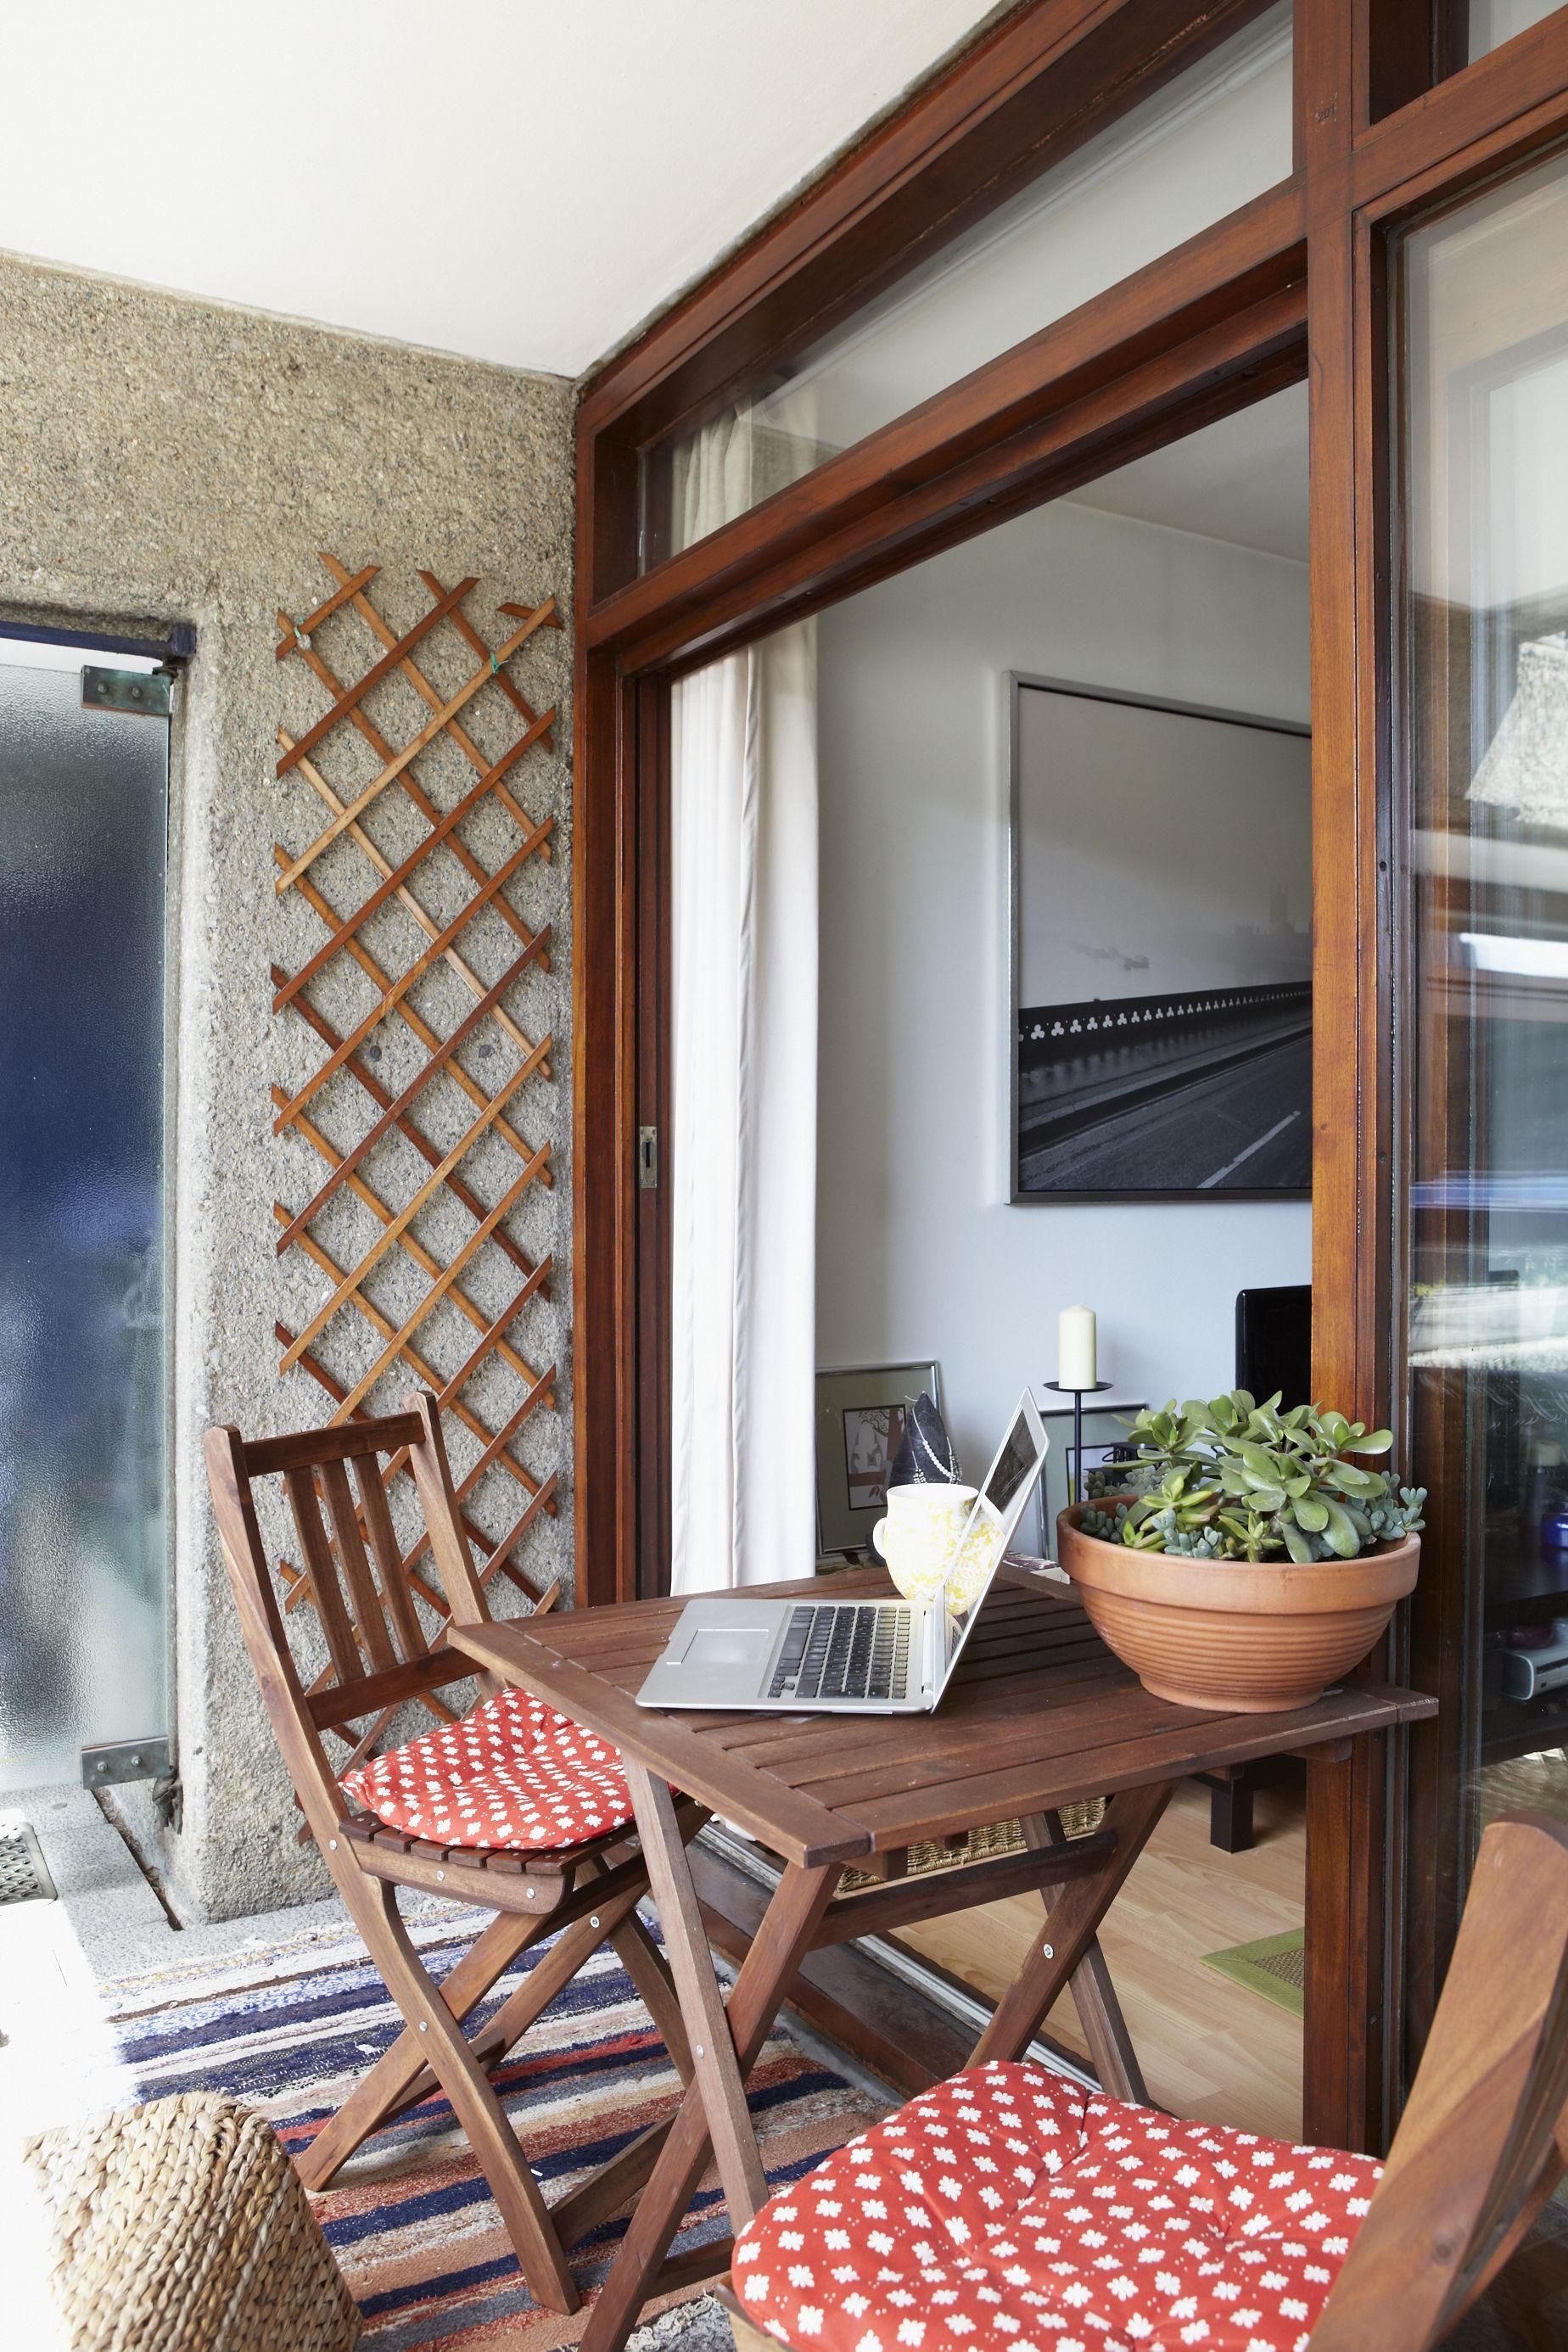 Balcony Design London: Helena Del Rio's London Flat Tour